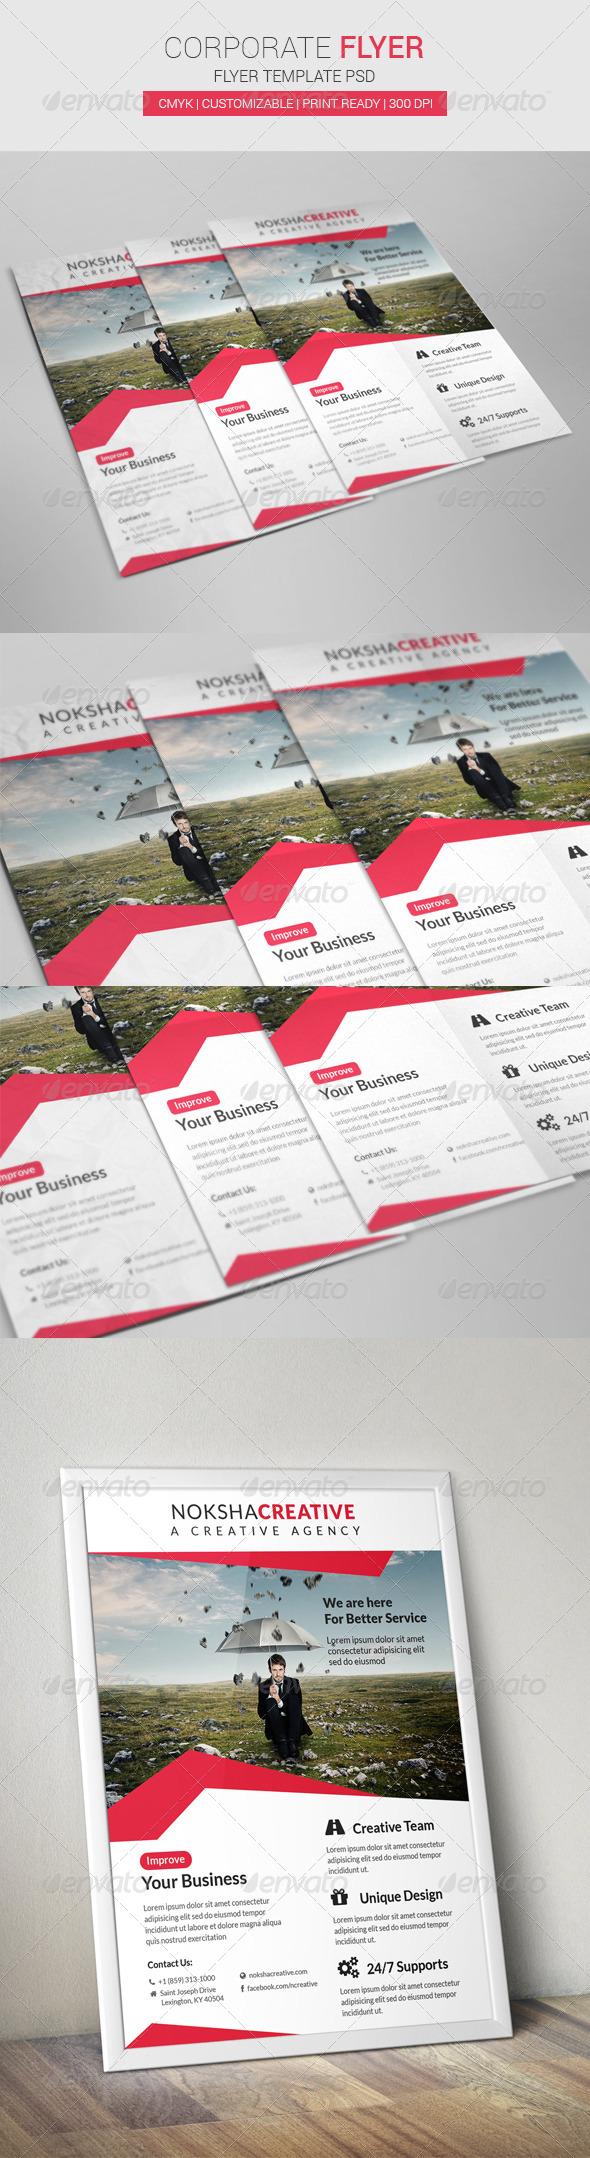 GraphicRiver Corporate Flyer 7016150